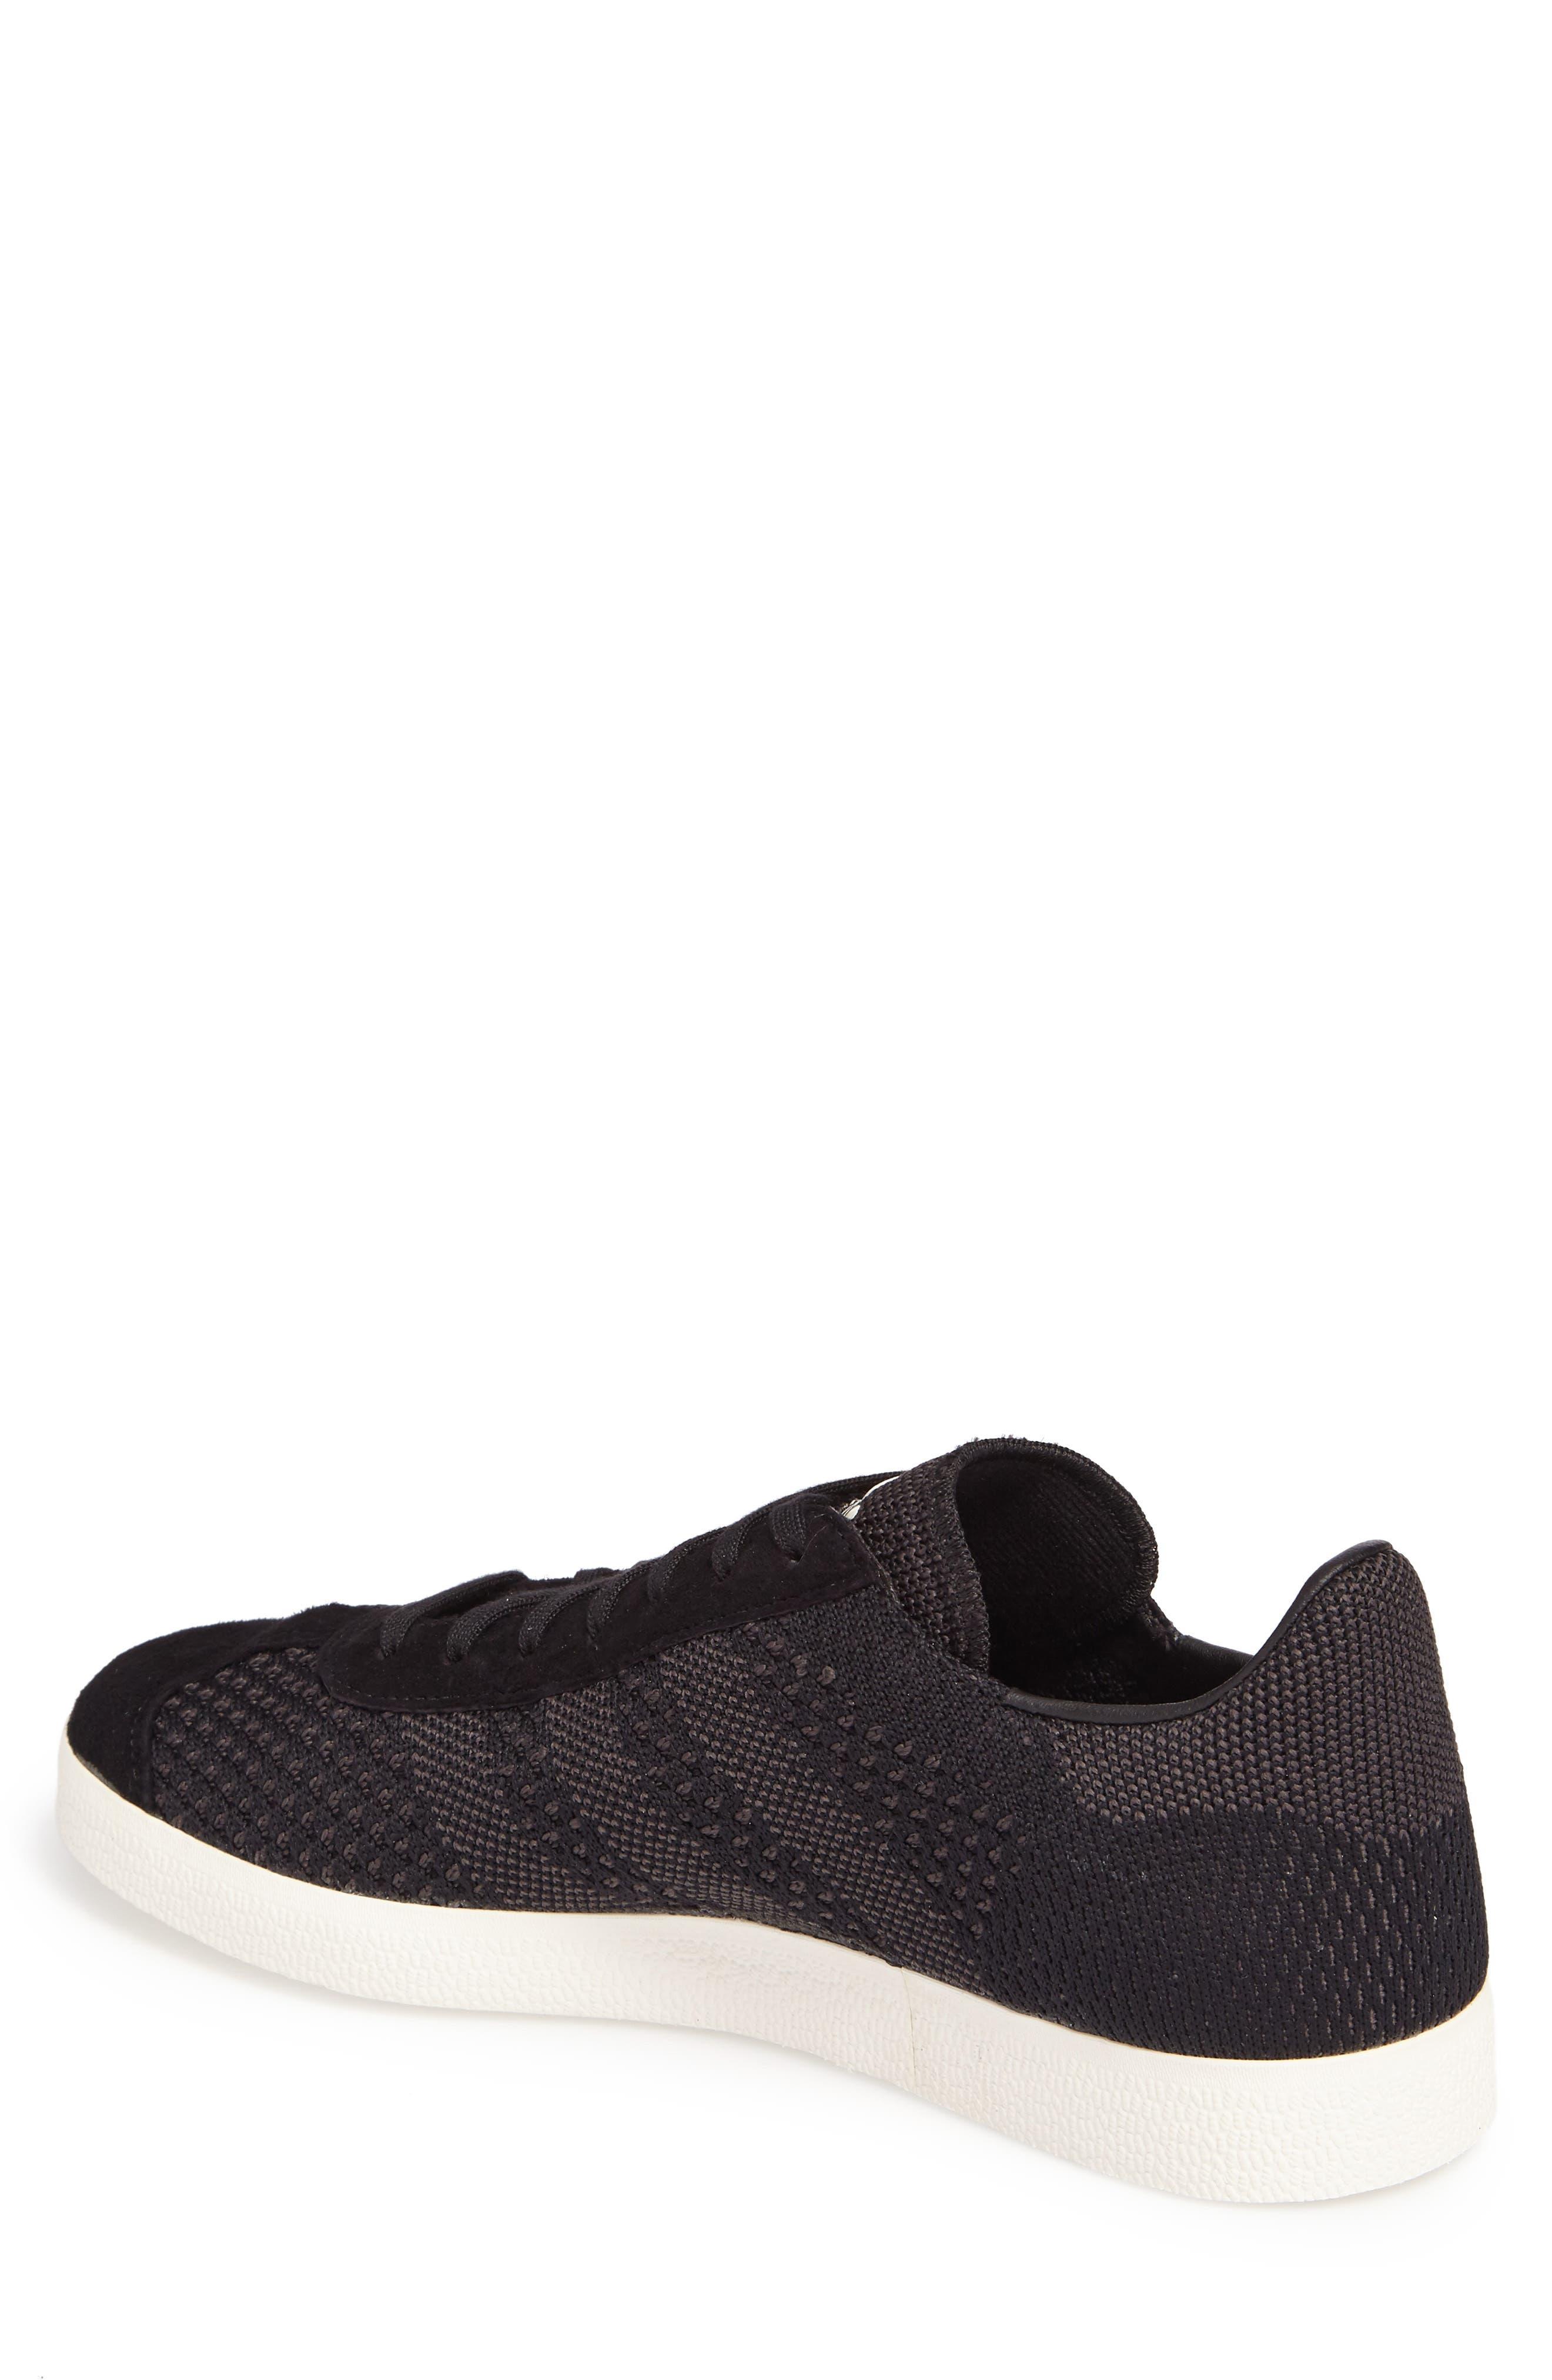 Gazelle Primeknit Sneaker,                             Alternate thumbnail 2, color,